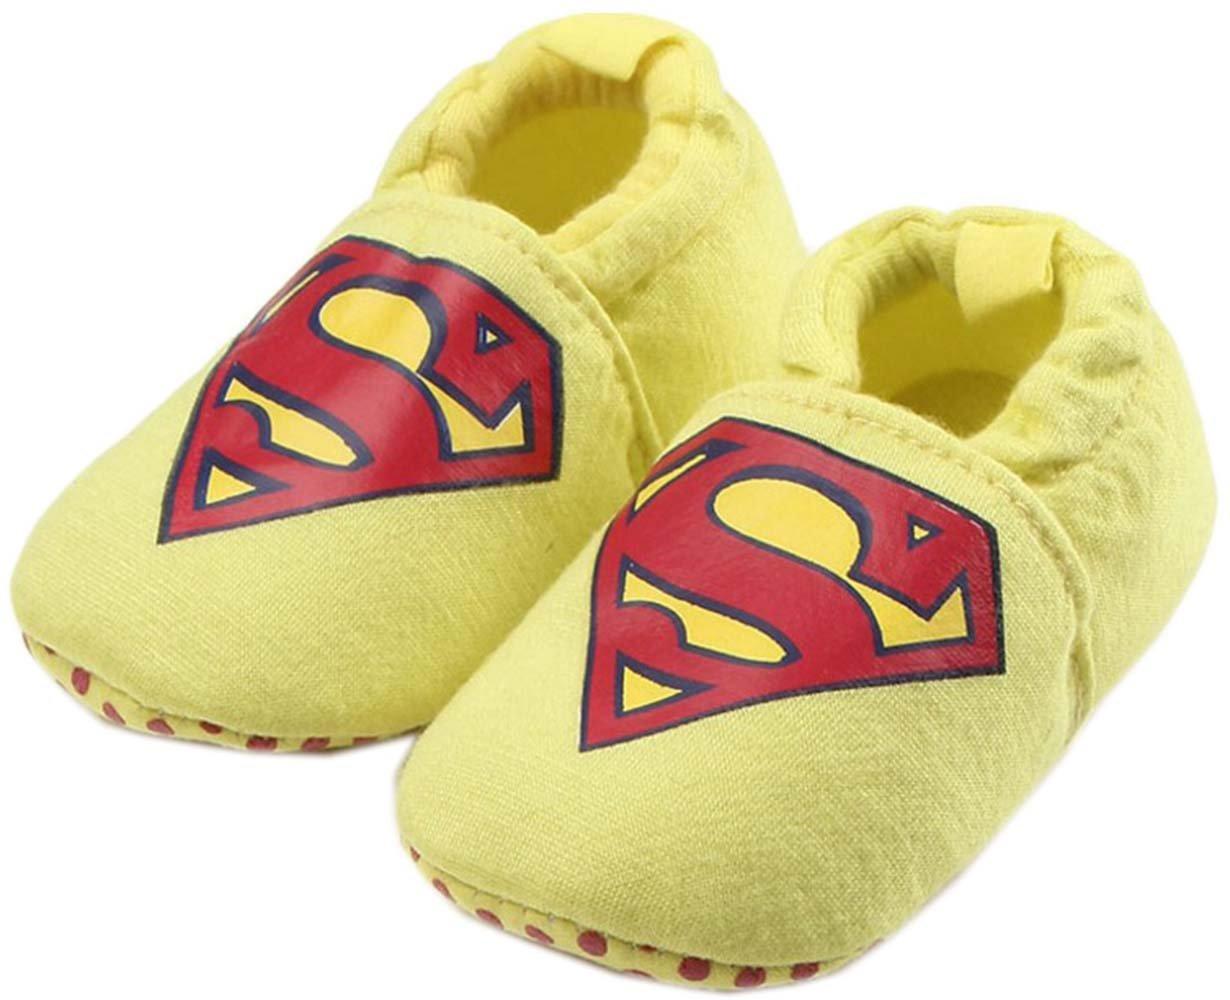 bettyhome Unisex Baby Newborn Black Star Soft Sole Infant Toddler Prewalker Sneakers 0-1 Year